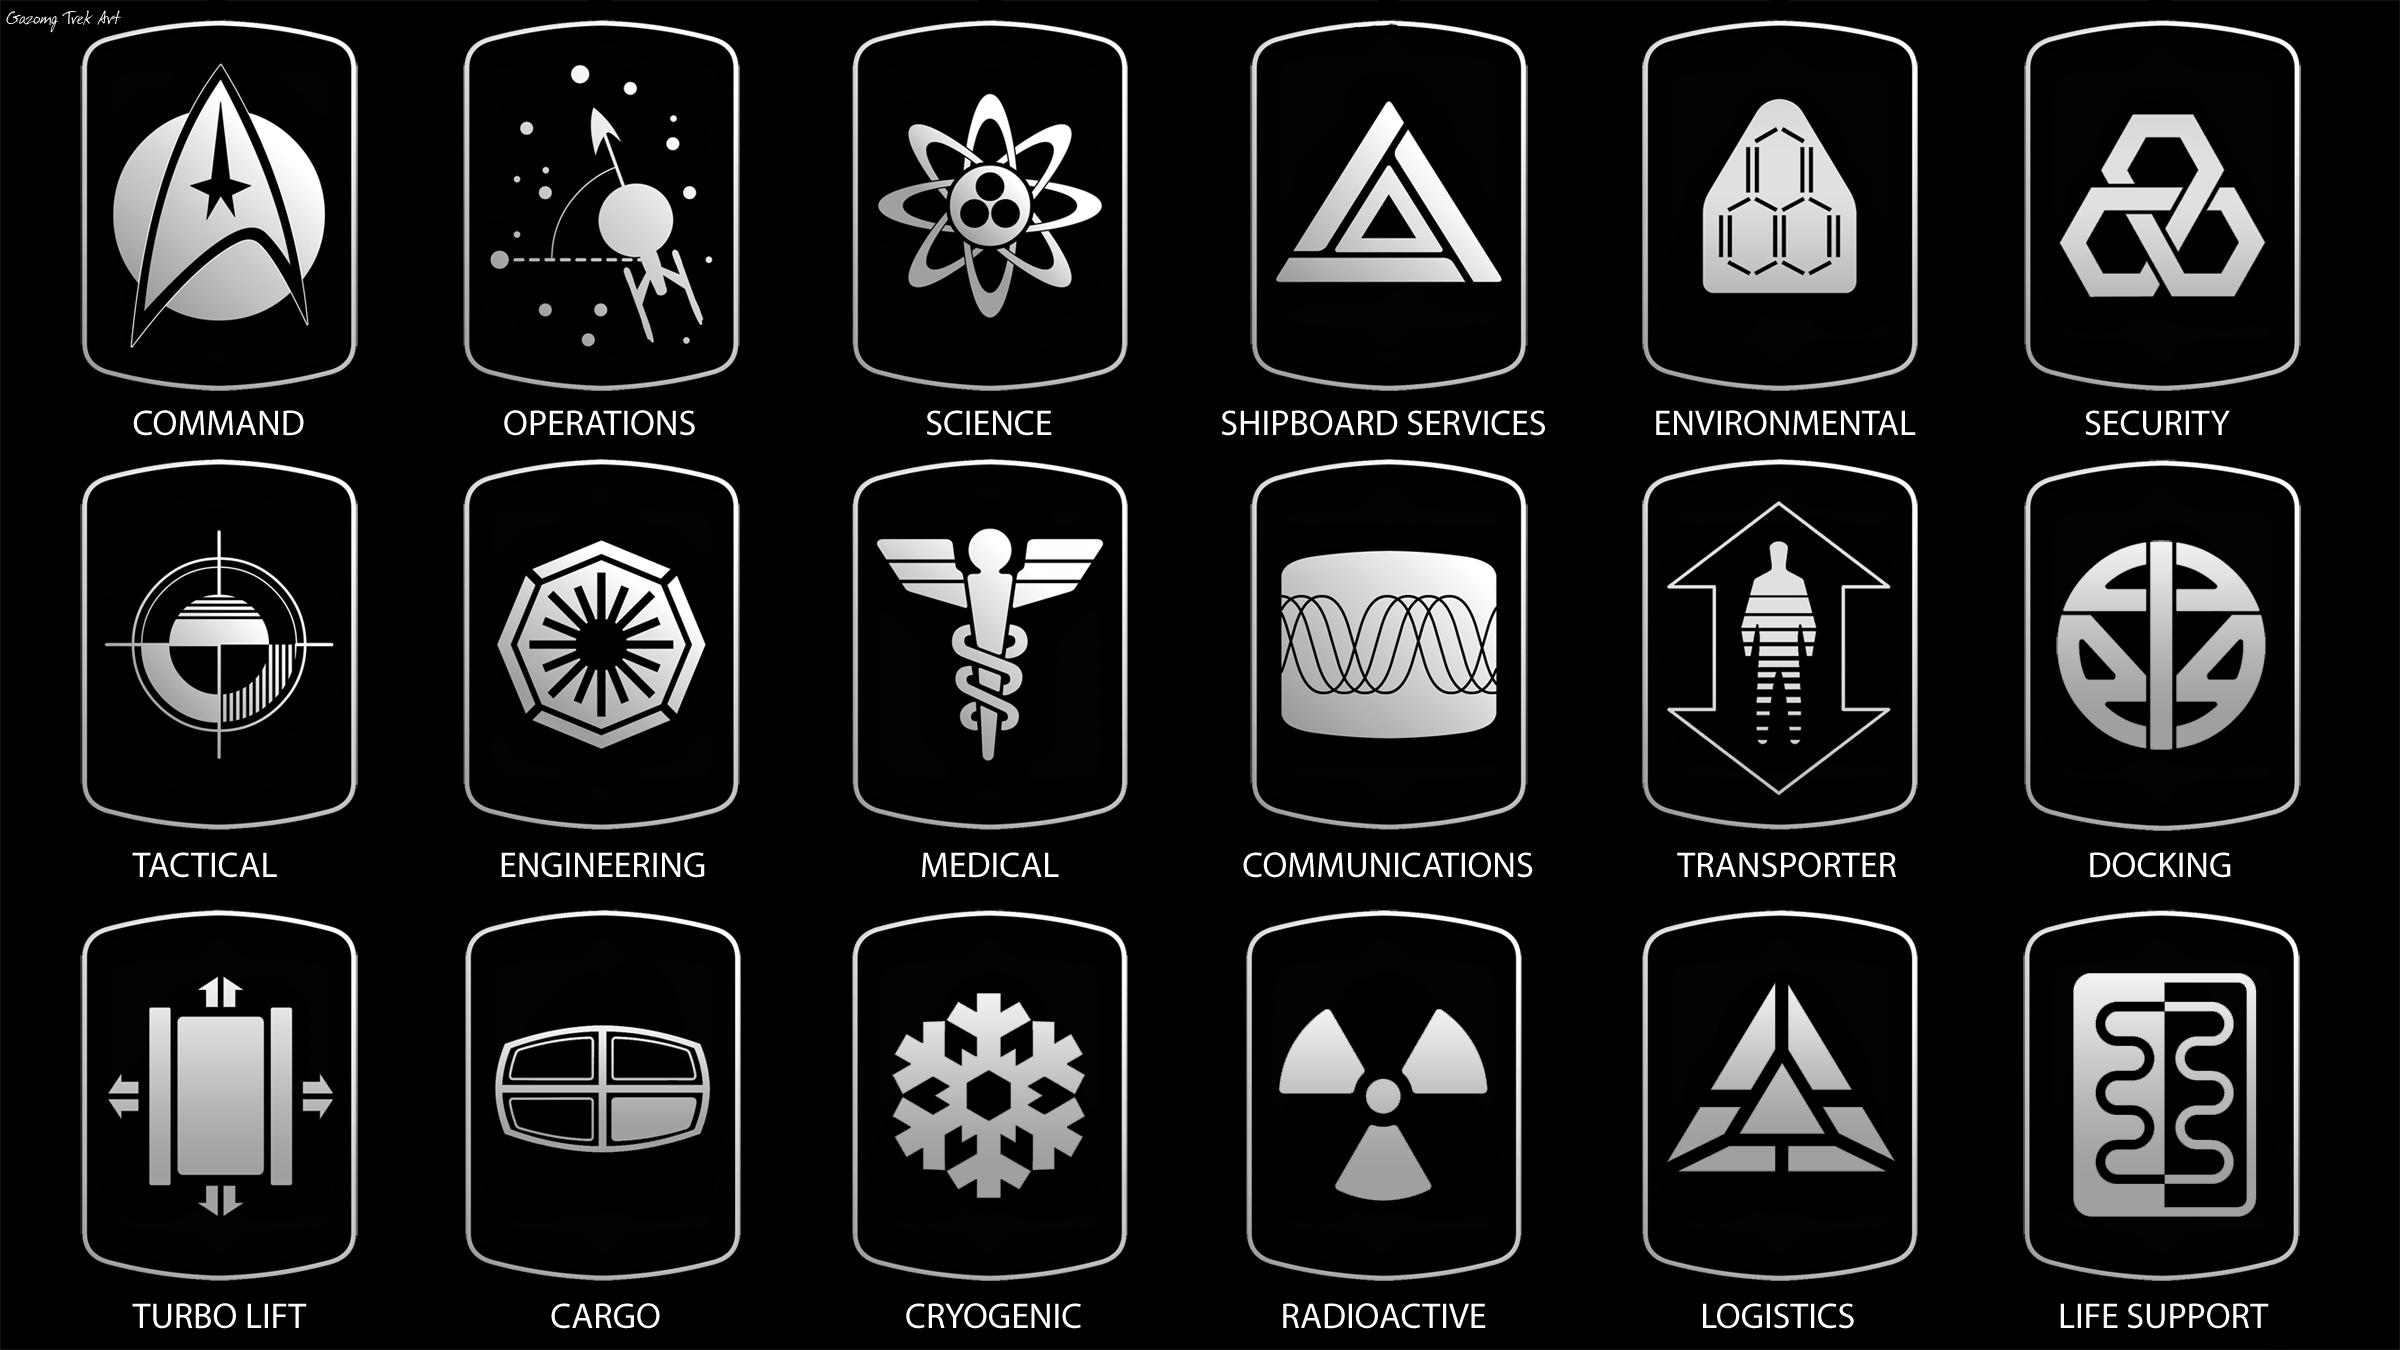 Star Trek Signage Department Logos and Insignia